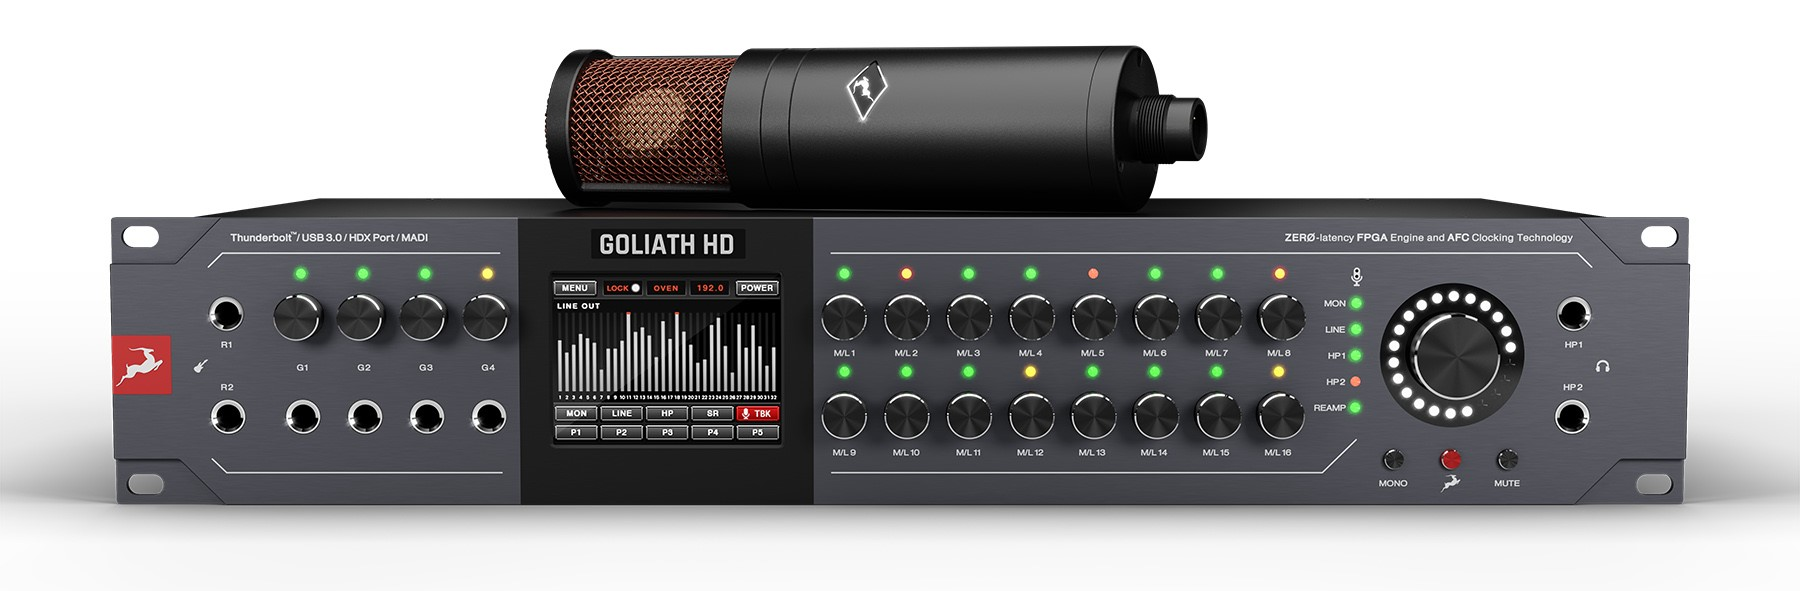 Antelope Audio präsentiert Orion Studio Synergy Core und Golialth HD | Gen 3